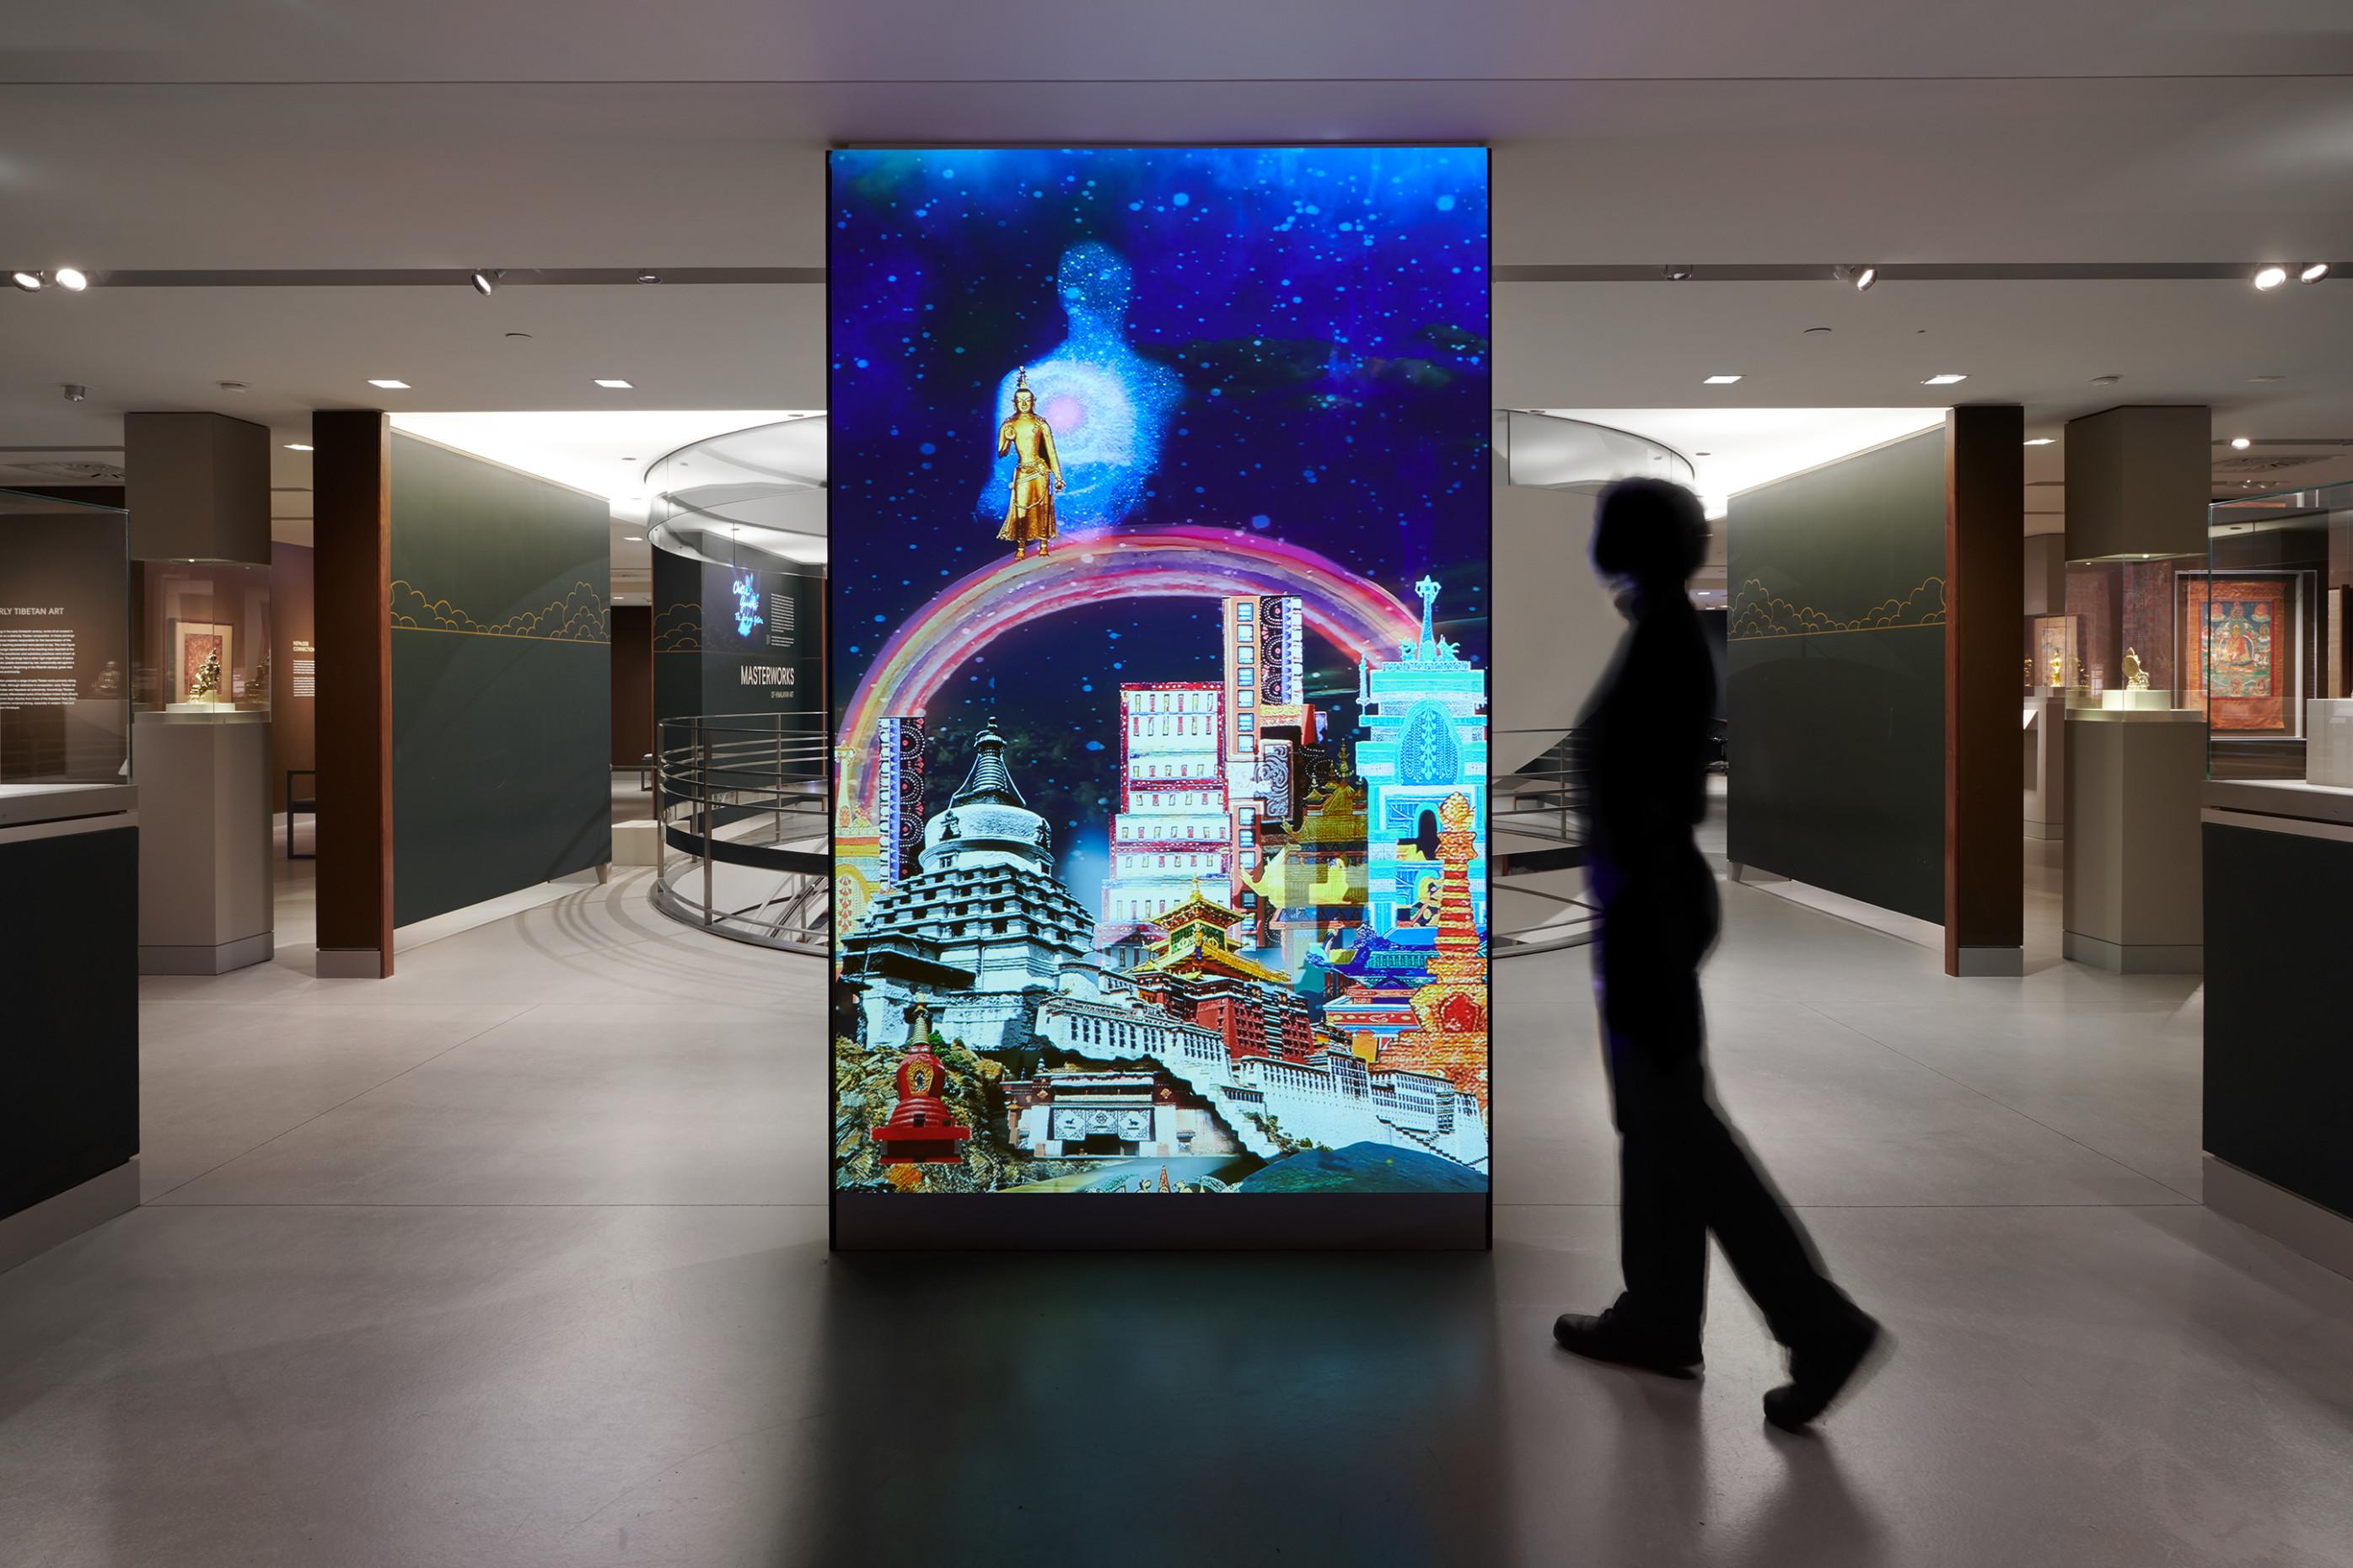 Installation view, 'Scorpion Gesture' at Rubin Museum of Art, New York, February 2 2018 — January 7 2019